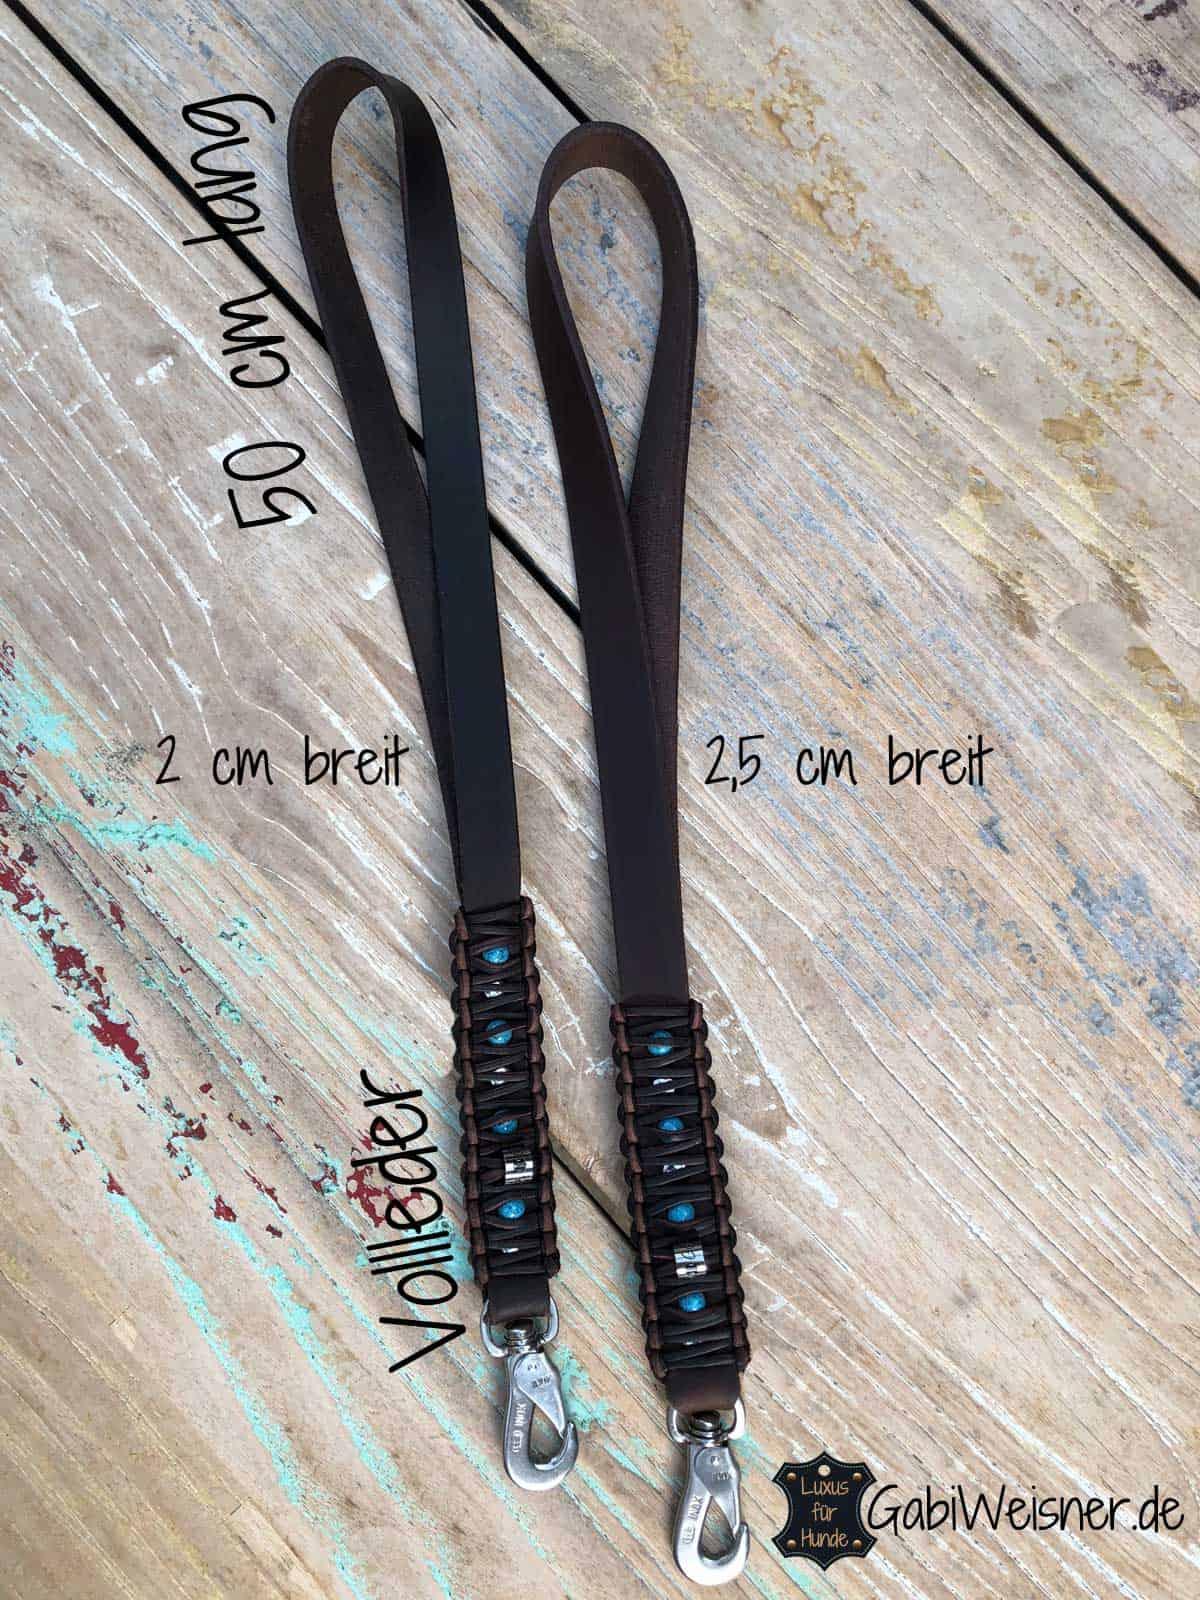 Kurze Hundeleine Leder 2 oder 2,5 cm breit geschnitten